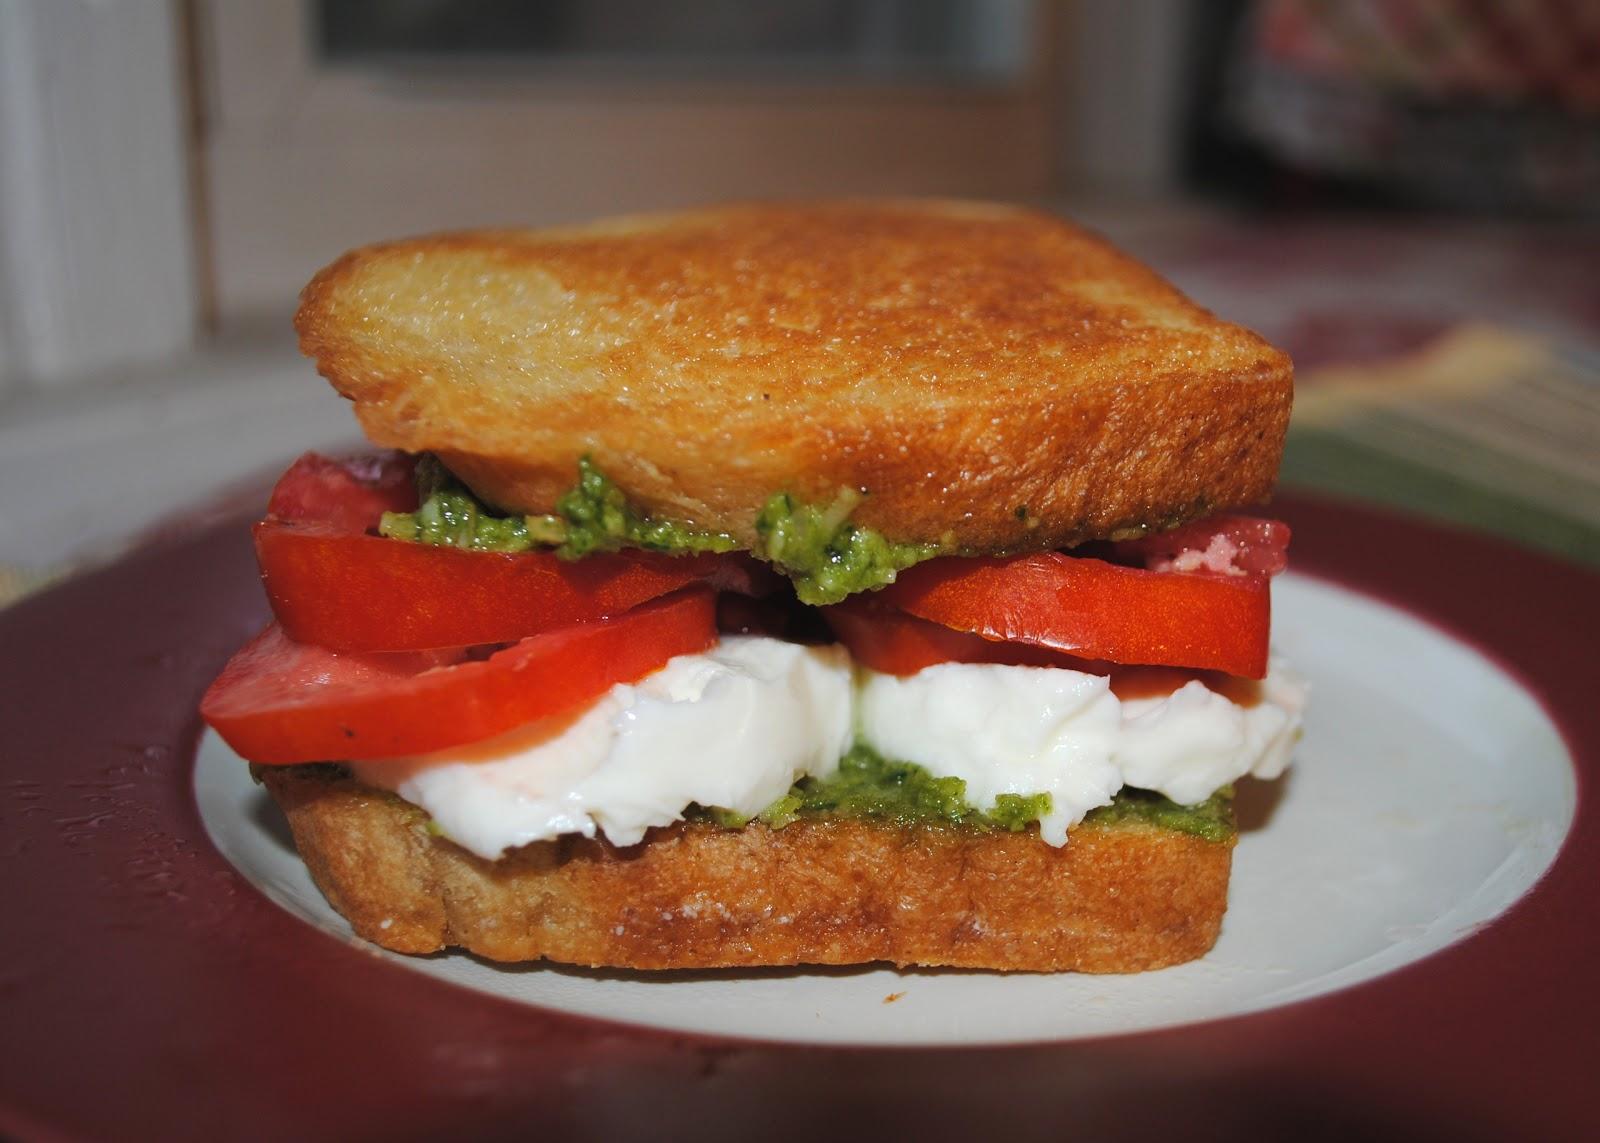 Homemade Basil Pesto, Tomato, and Mozzarella Sandwiches